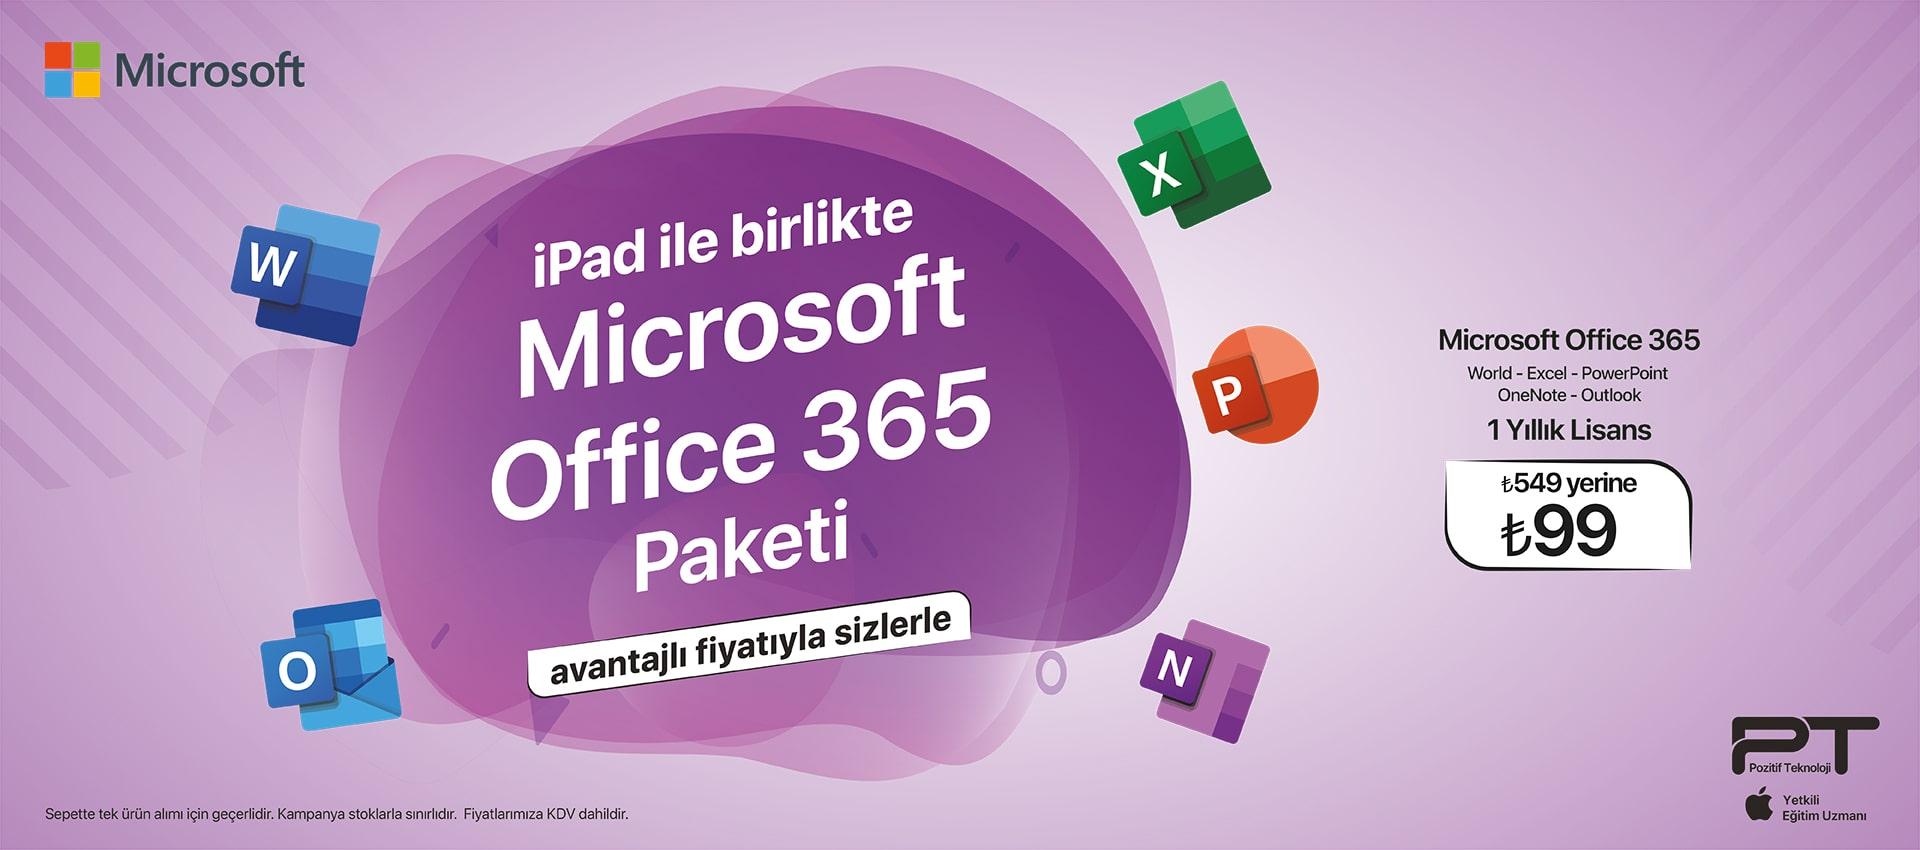 Microsoft iPAD